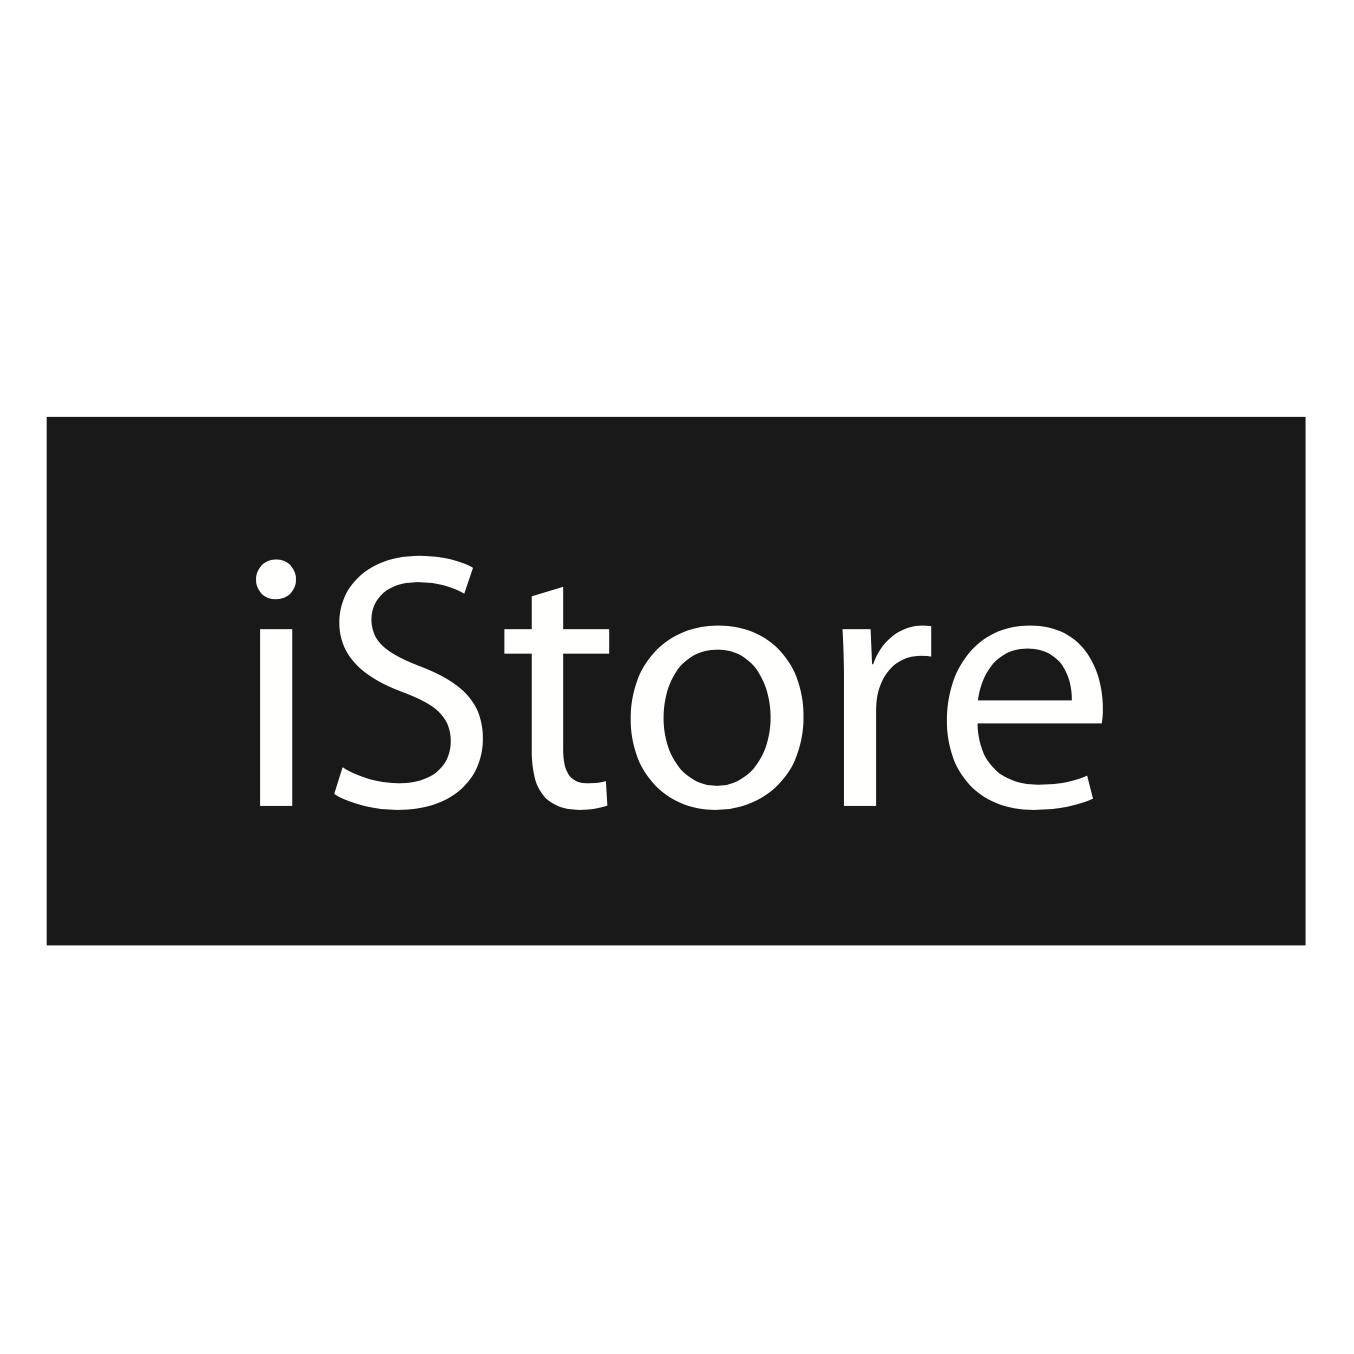 iPhone X Silicone Case - Marine Green